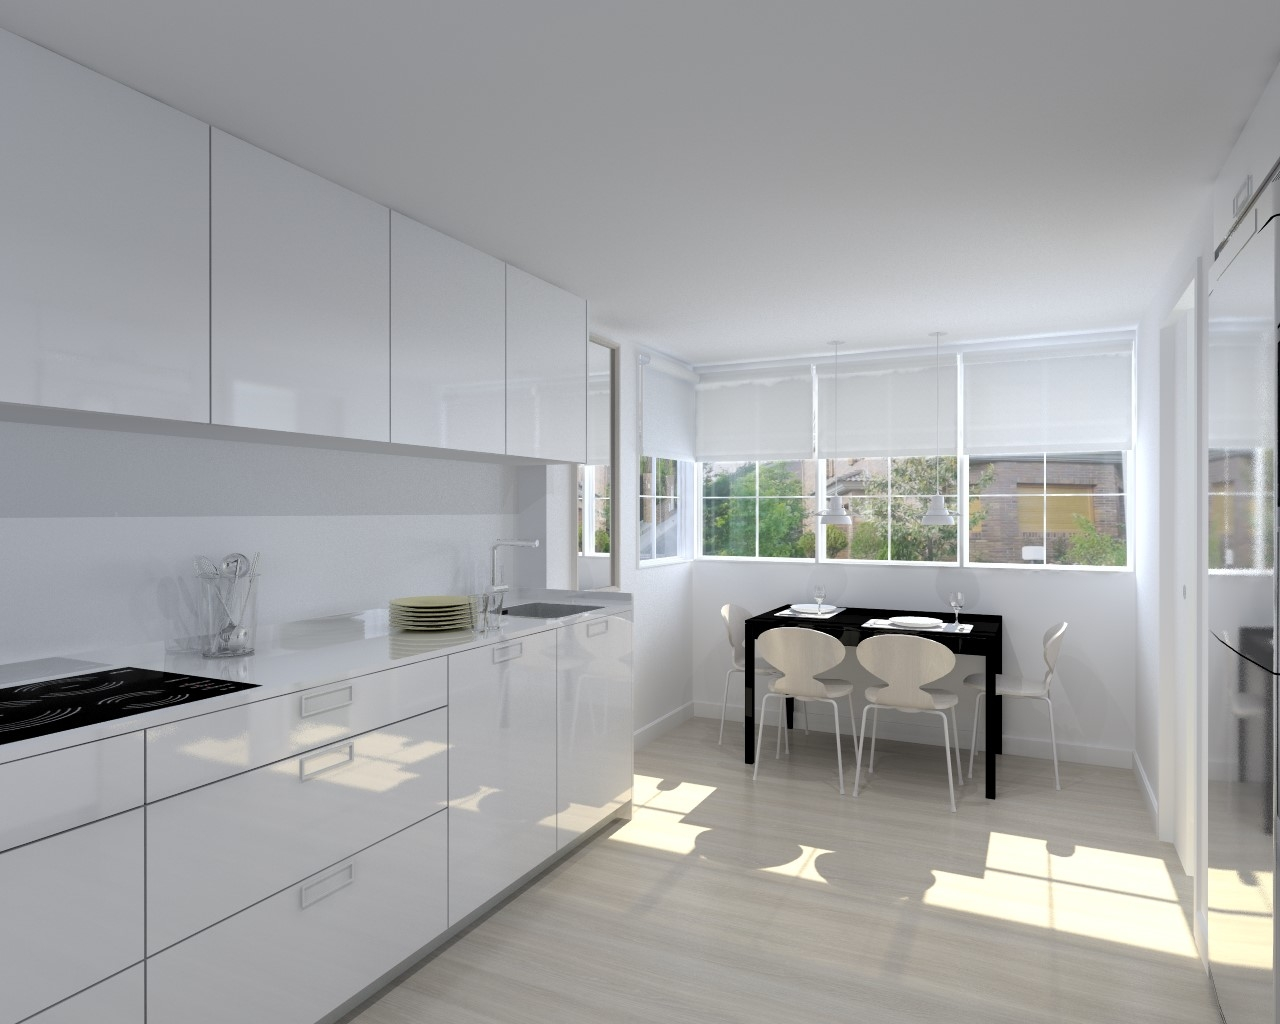 Cocina santos modelo plano blanco brillo encimera neolith for Cocinas blancas 2016